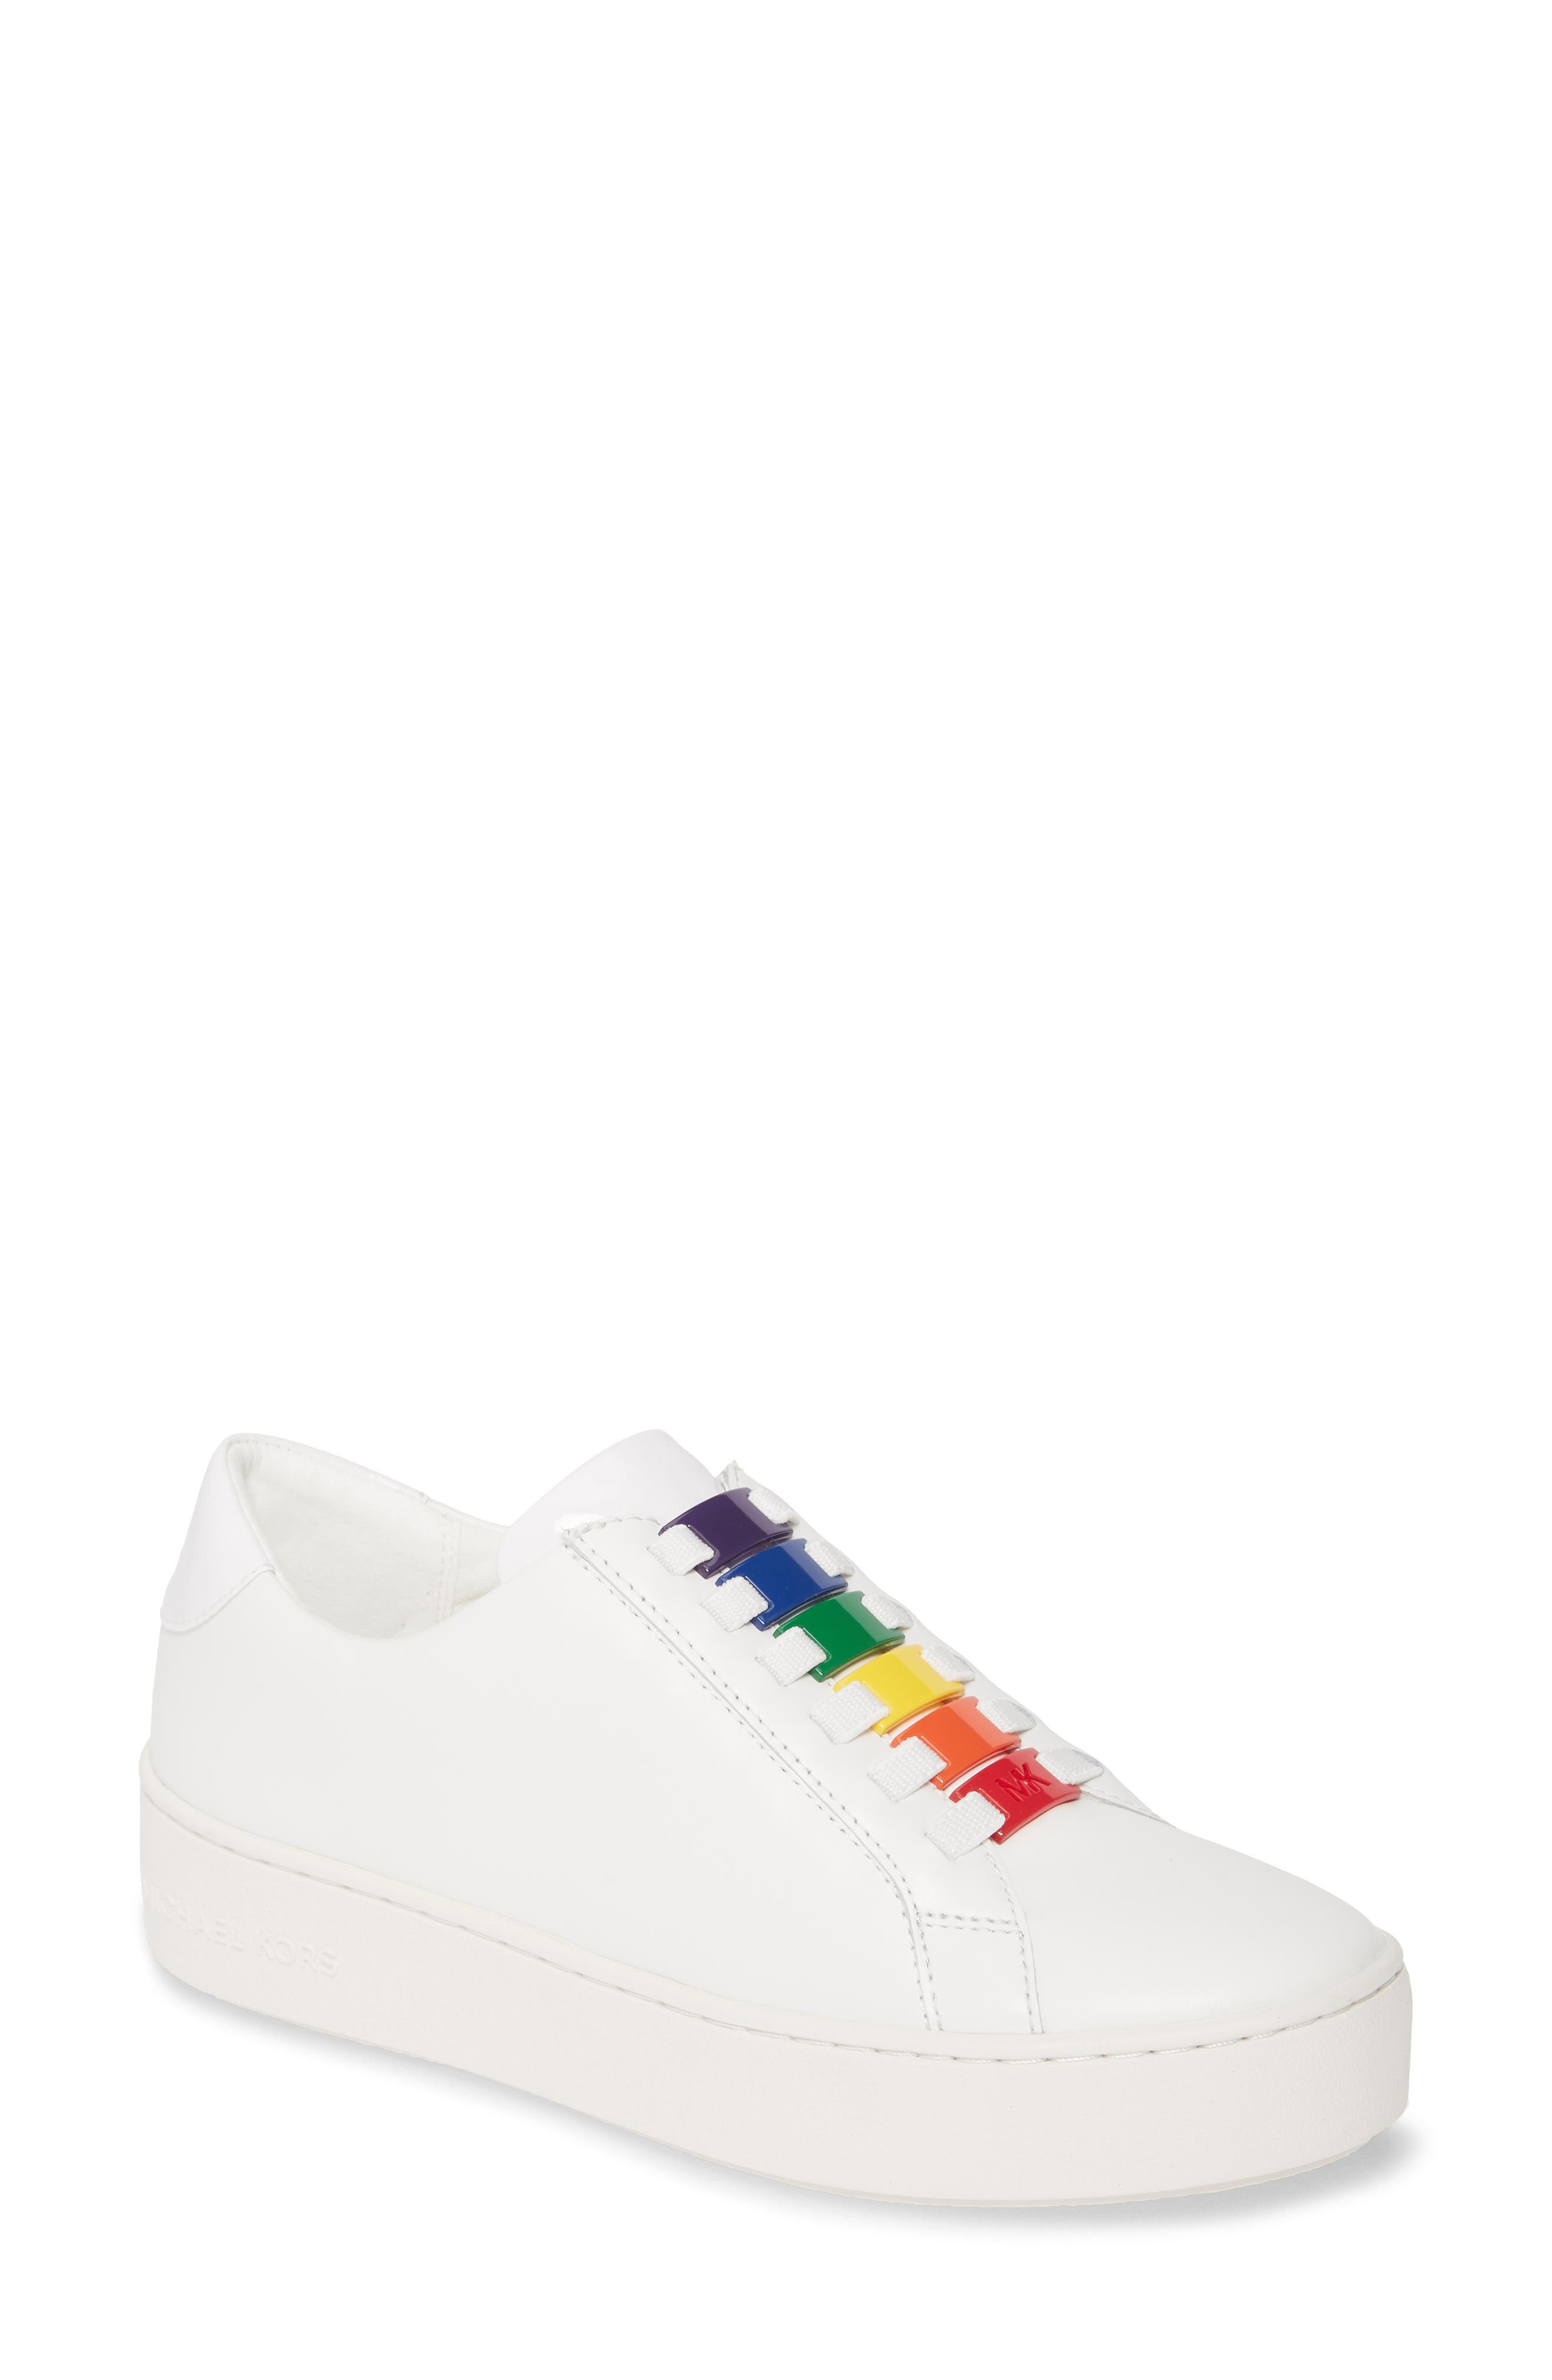 Michael Michael Kors Cameron Sneaker, White